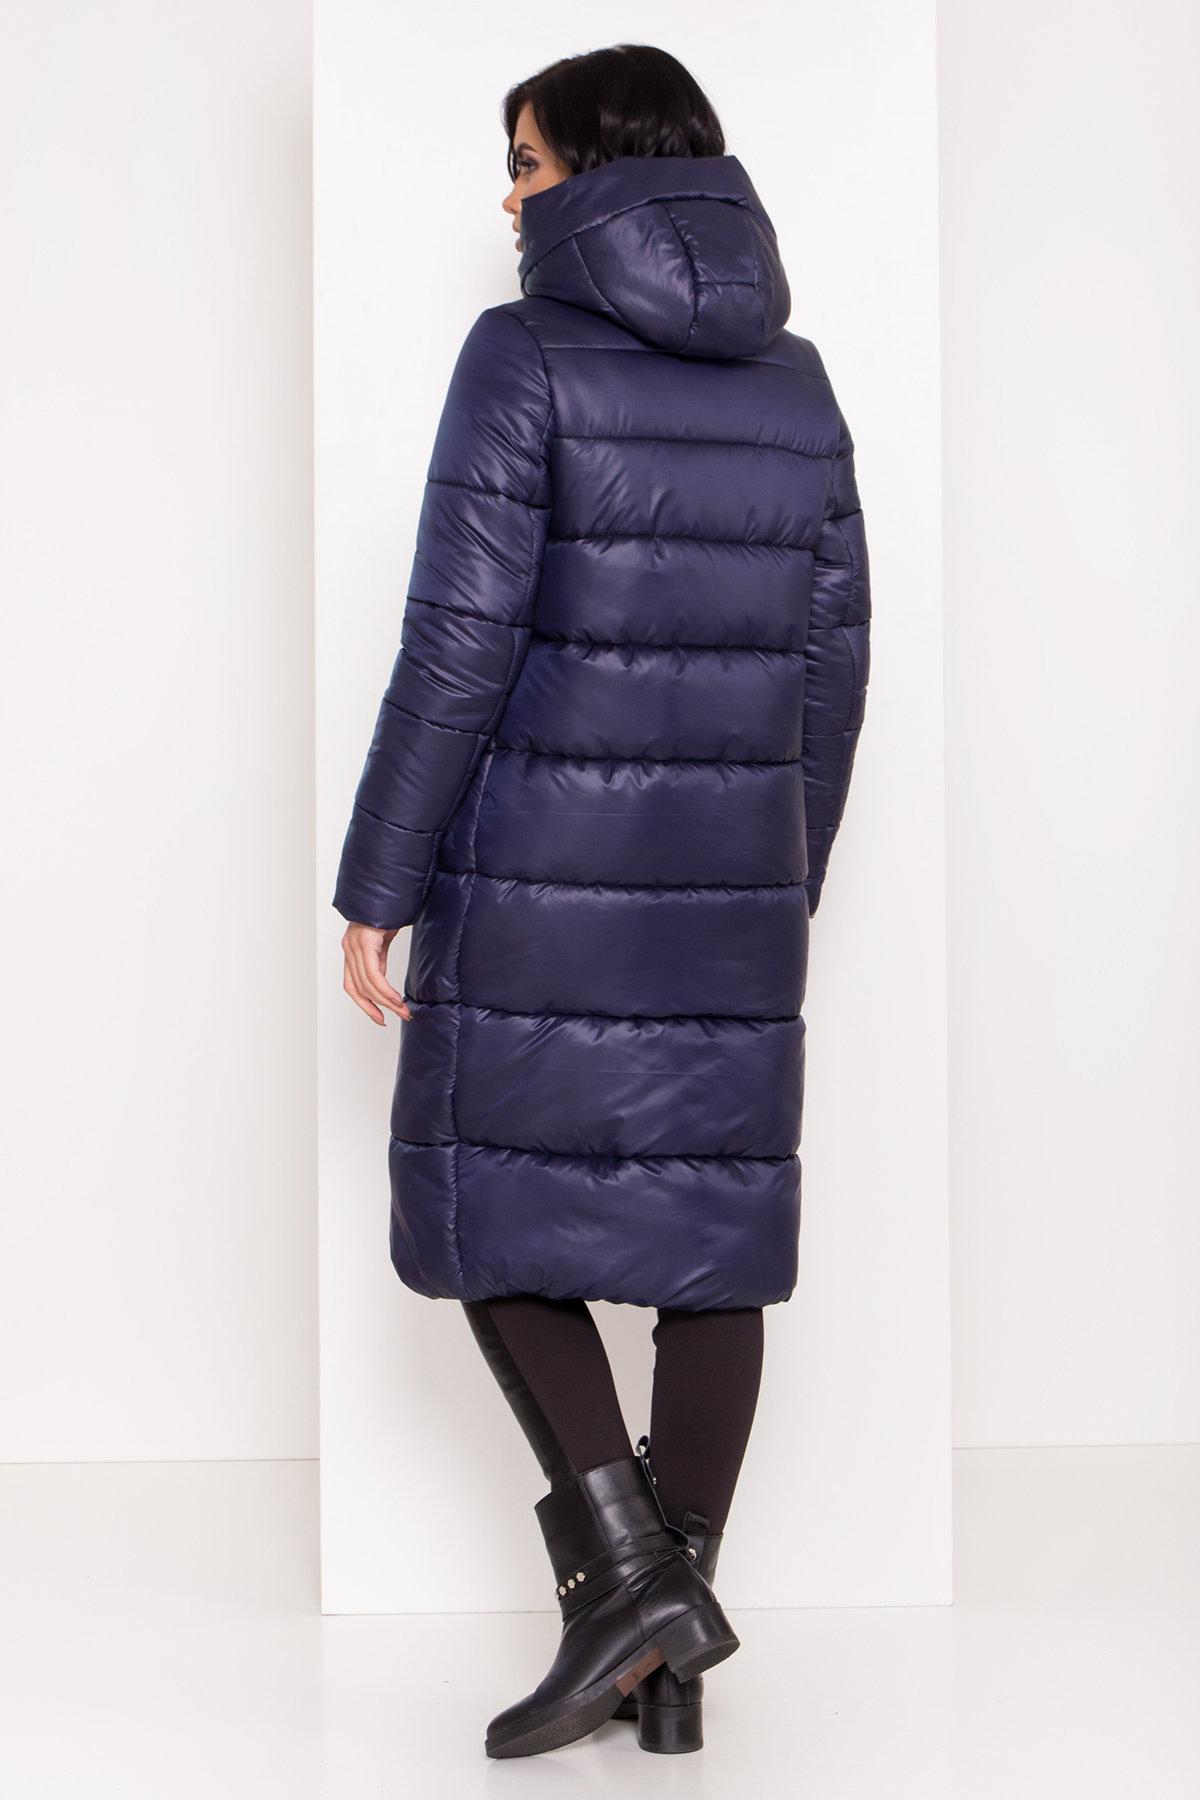 Длинная зимняя куртка-пуховик Сигма 8040 АРТ. 43989 Цвет: Т.синий - фото 2, интернет магазин tm-modus.ru